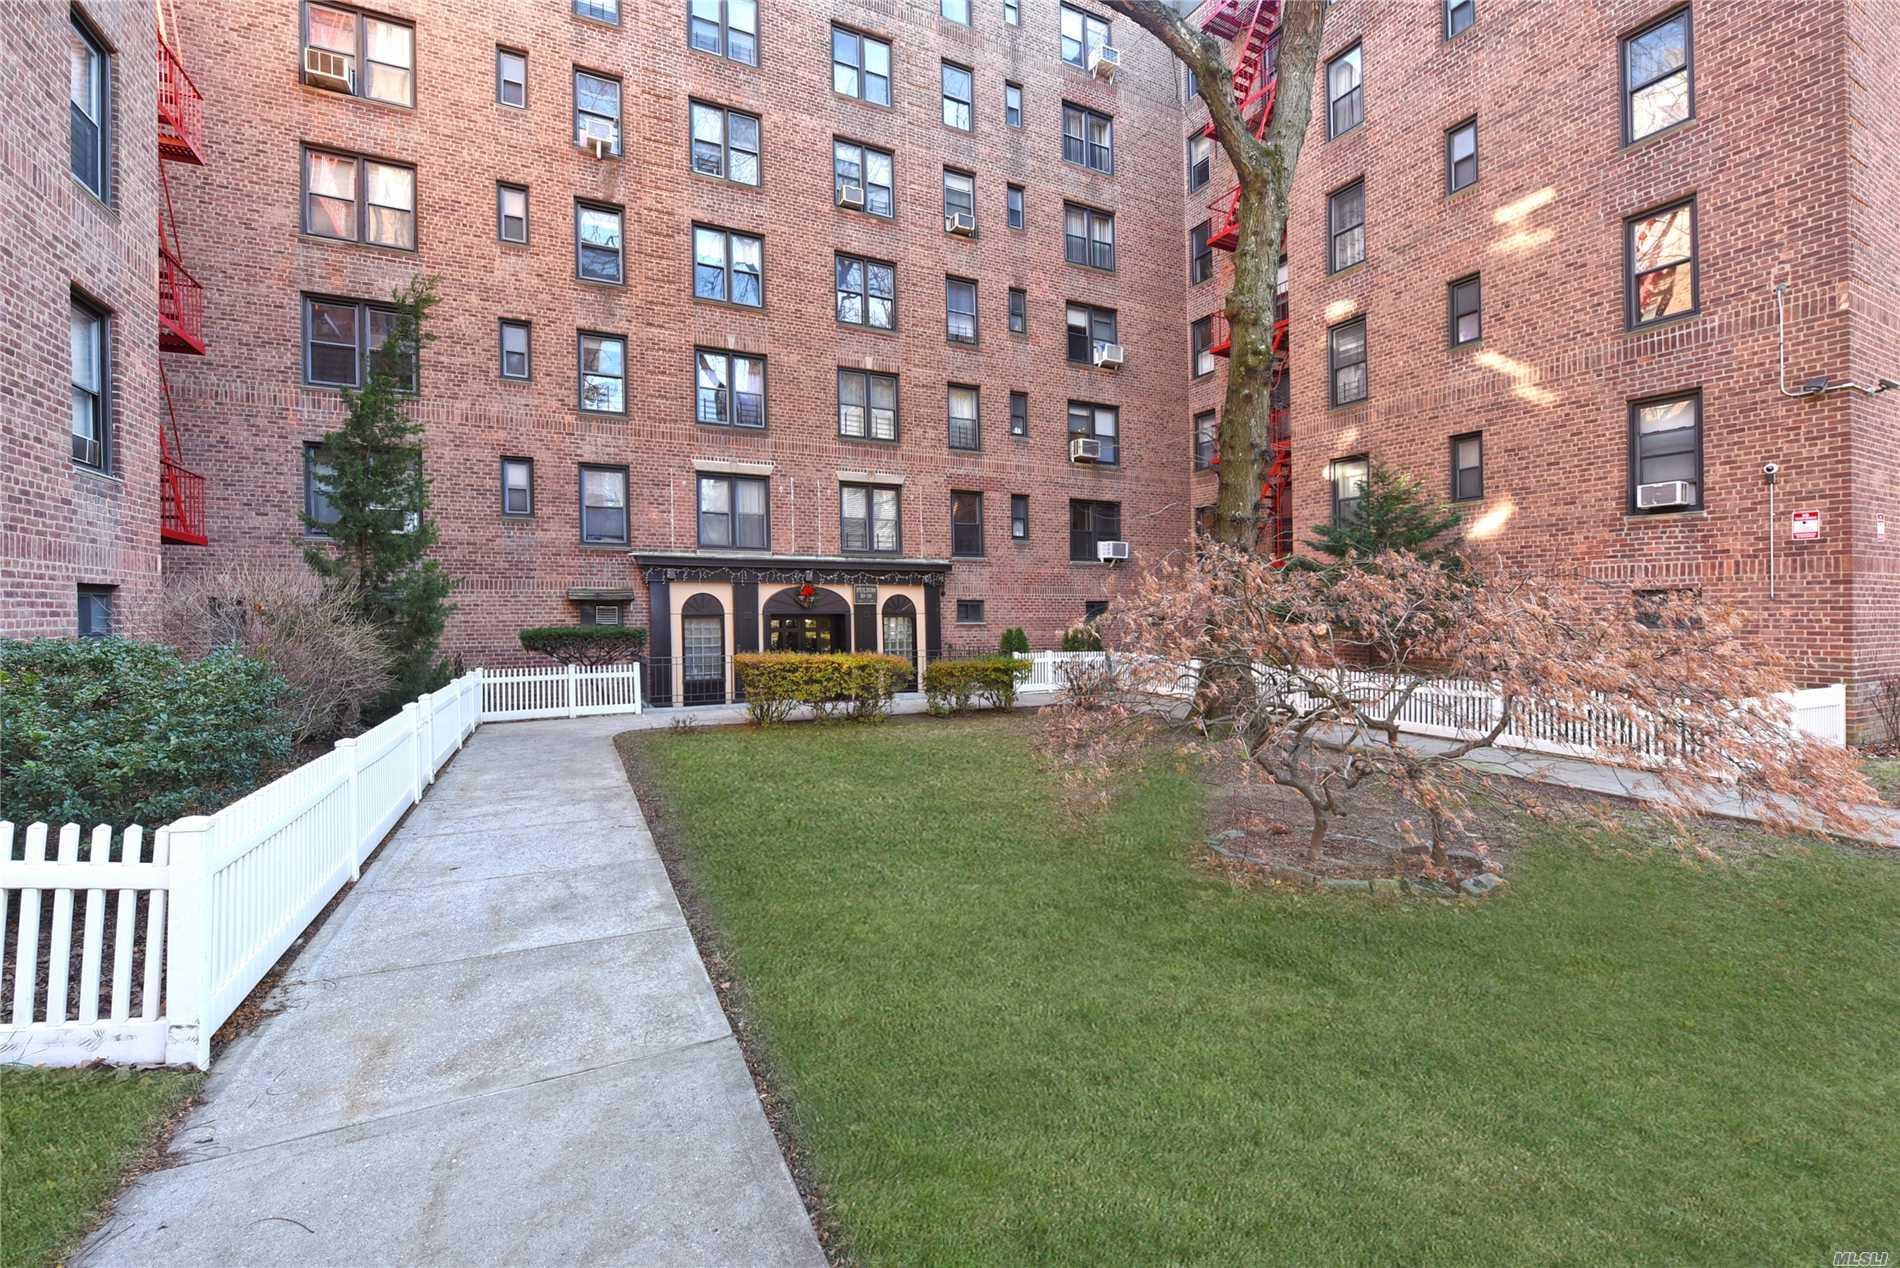 83-20 98th St, 3U - Woodhaven, New York